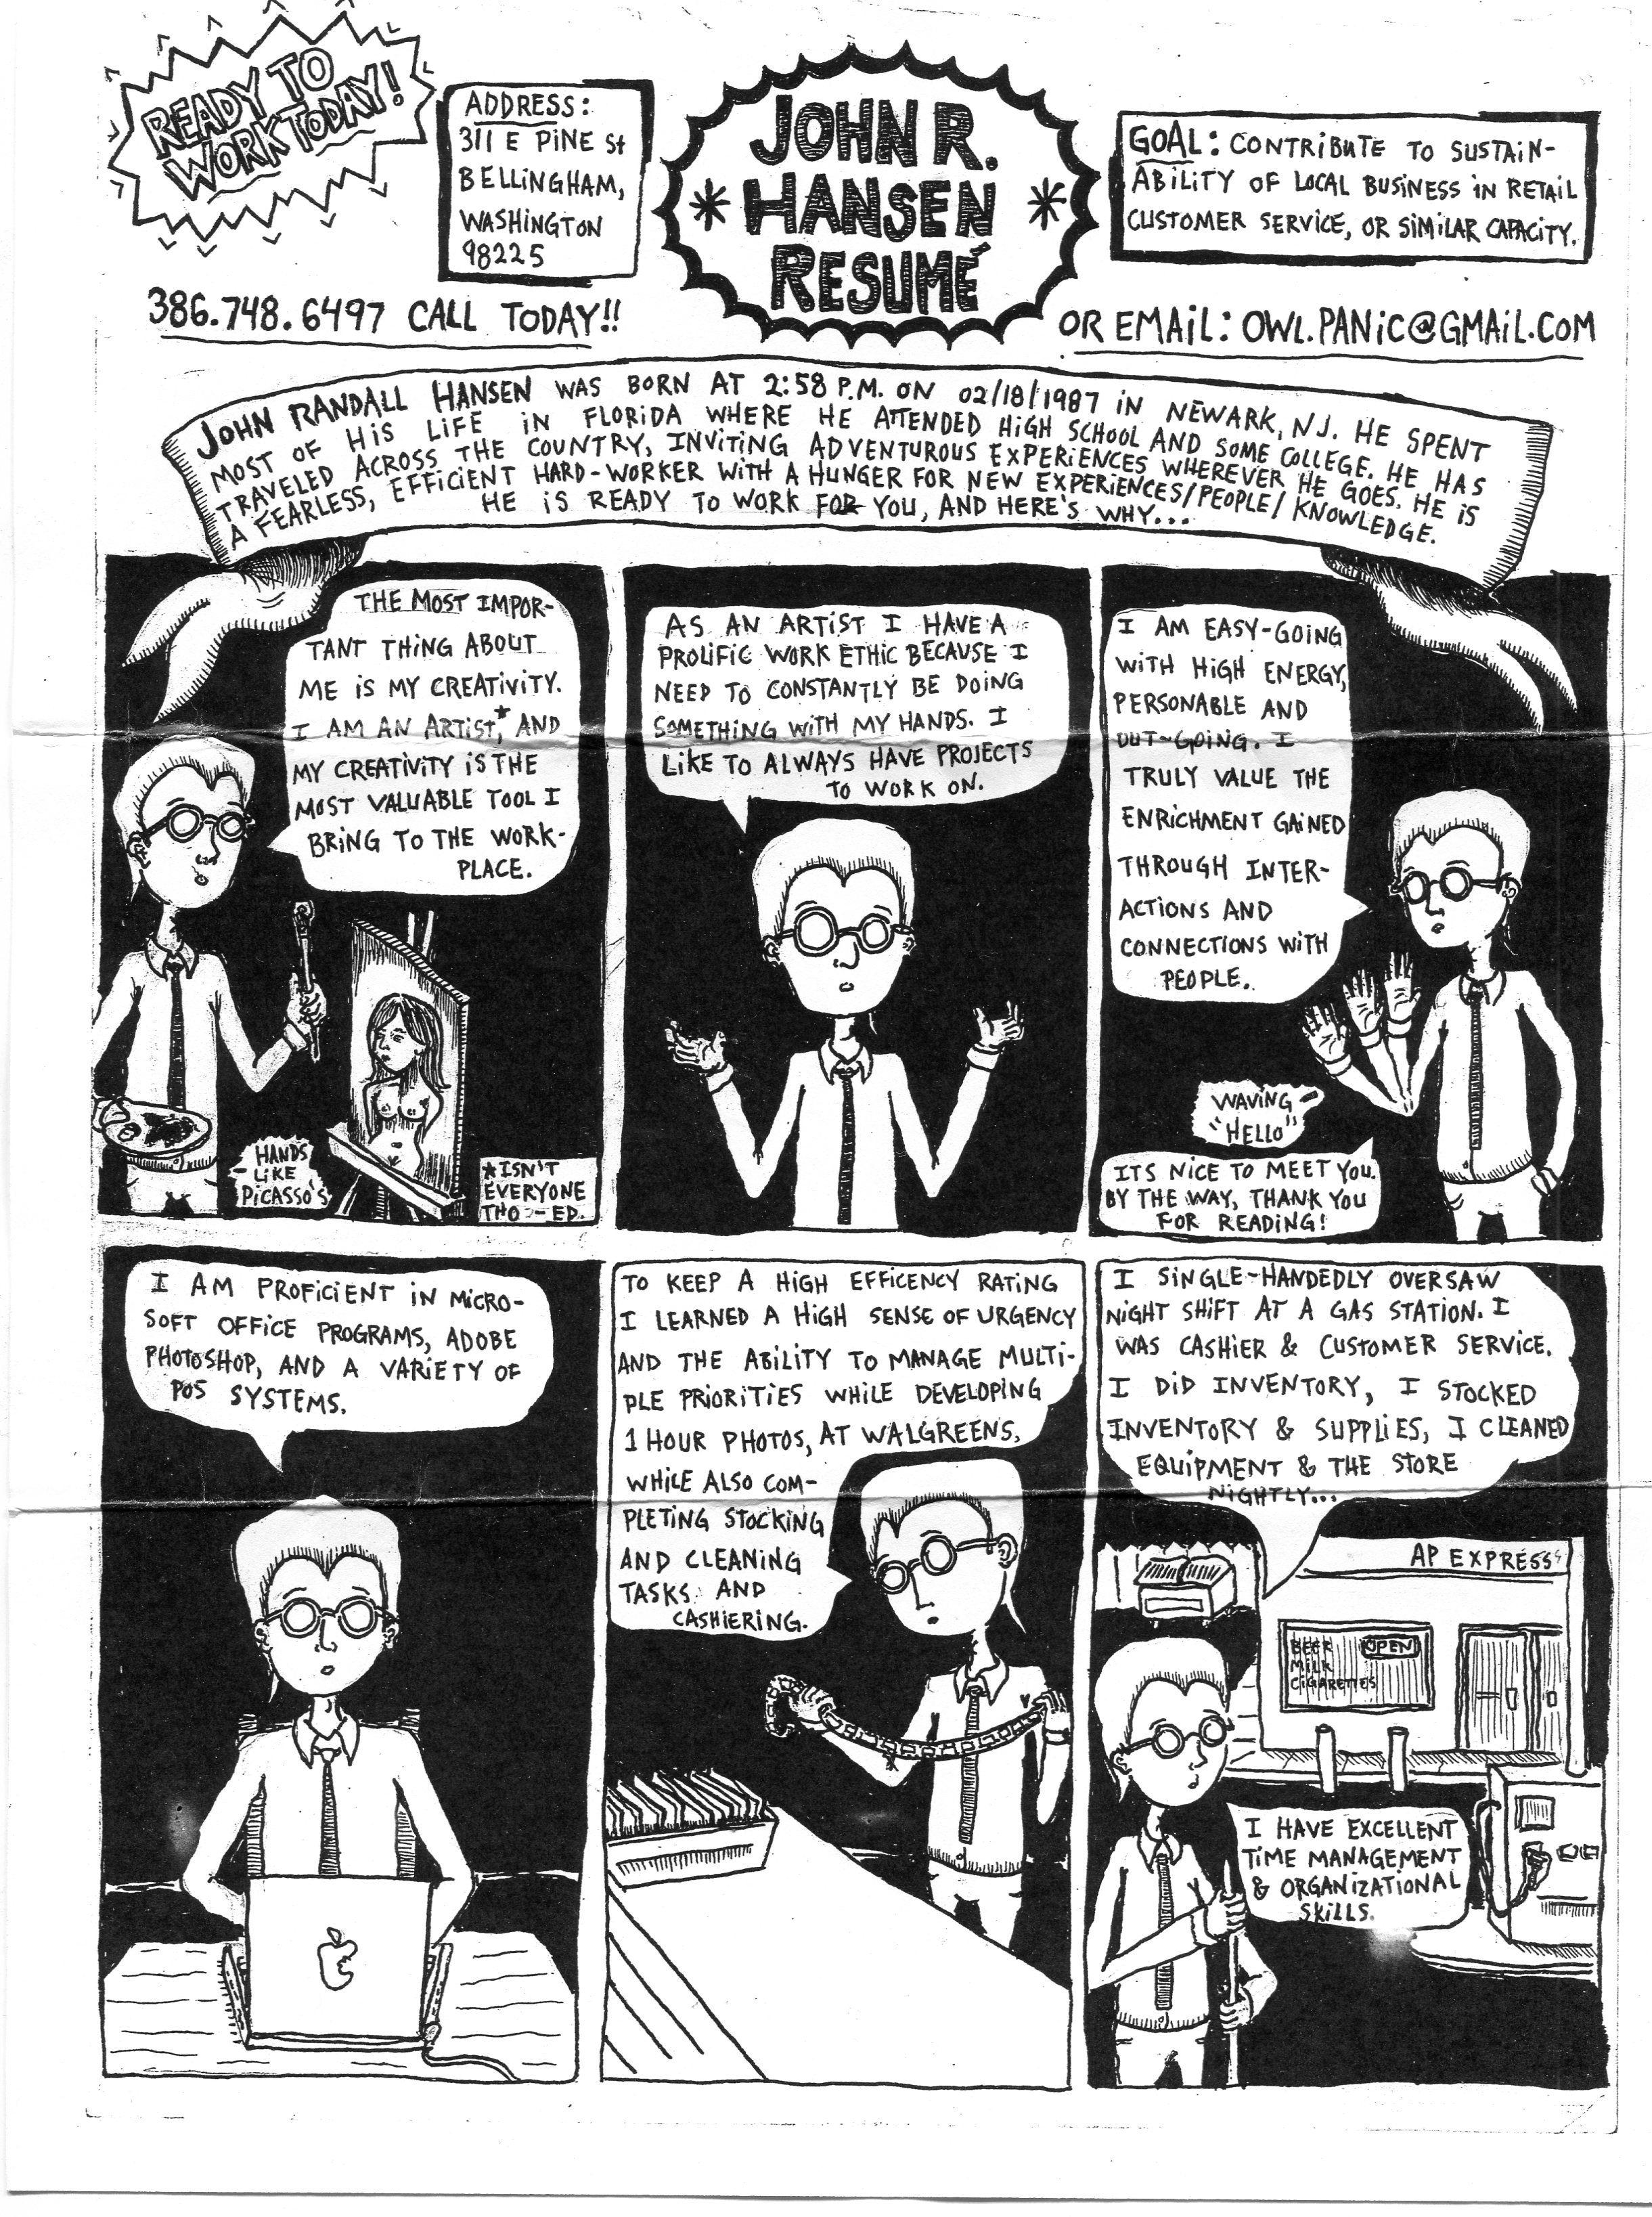 John hansen comiczine resume creative writing ideas